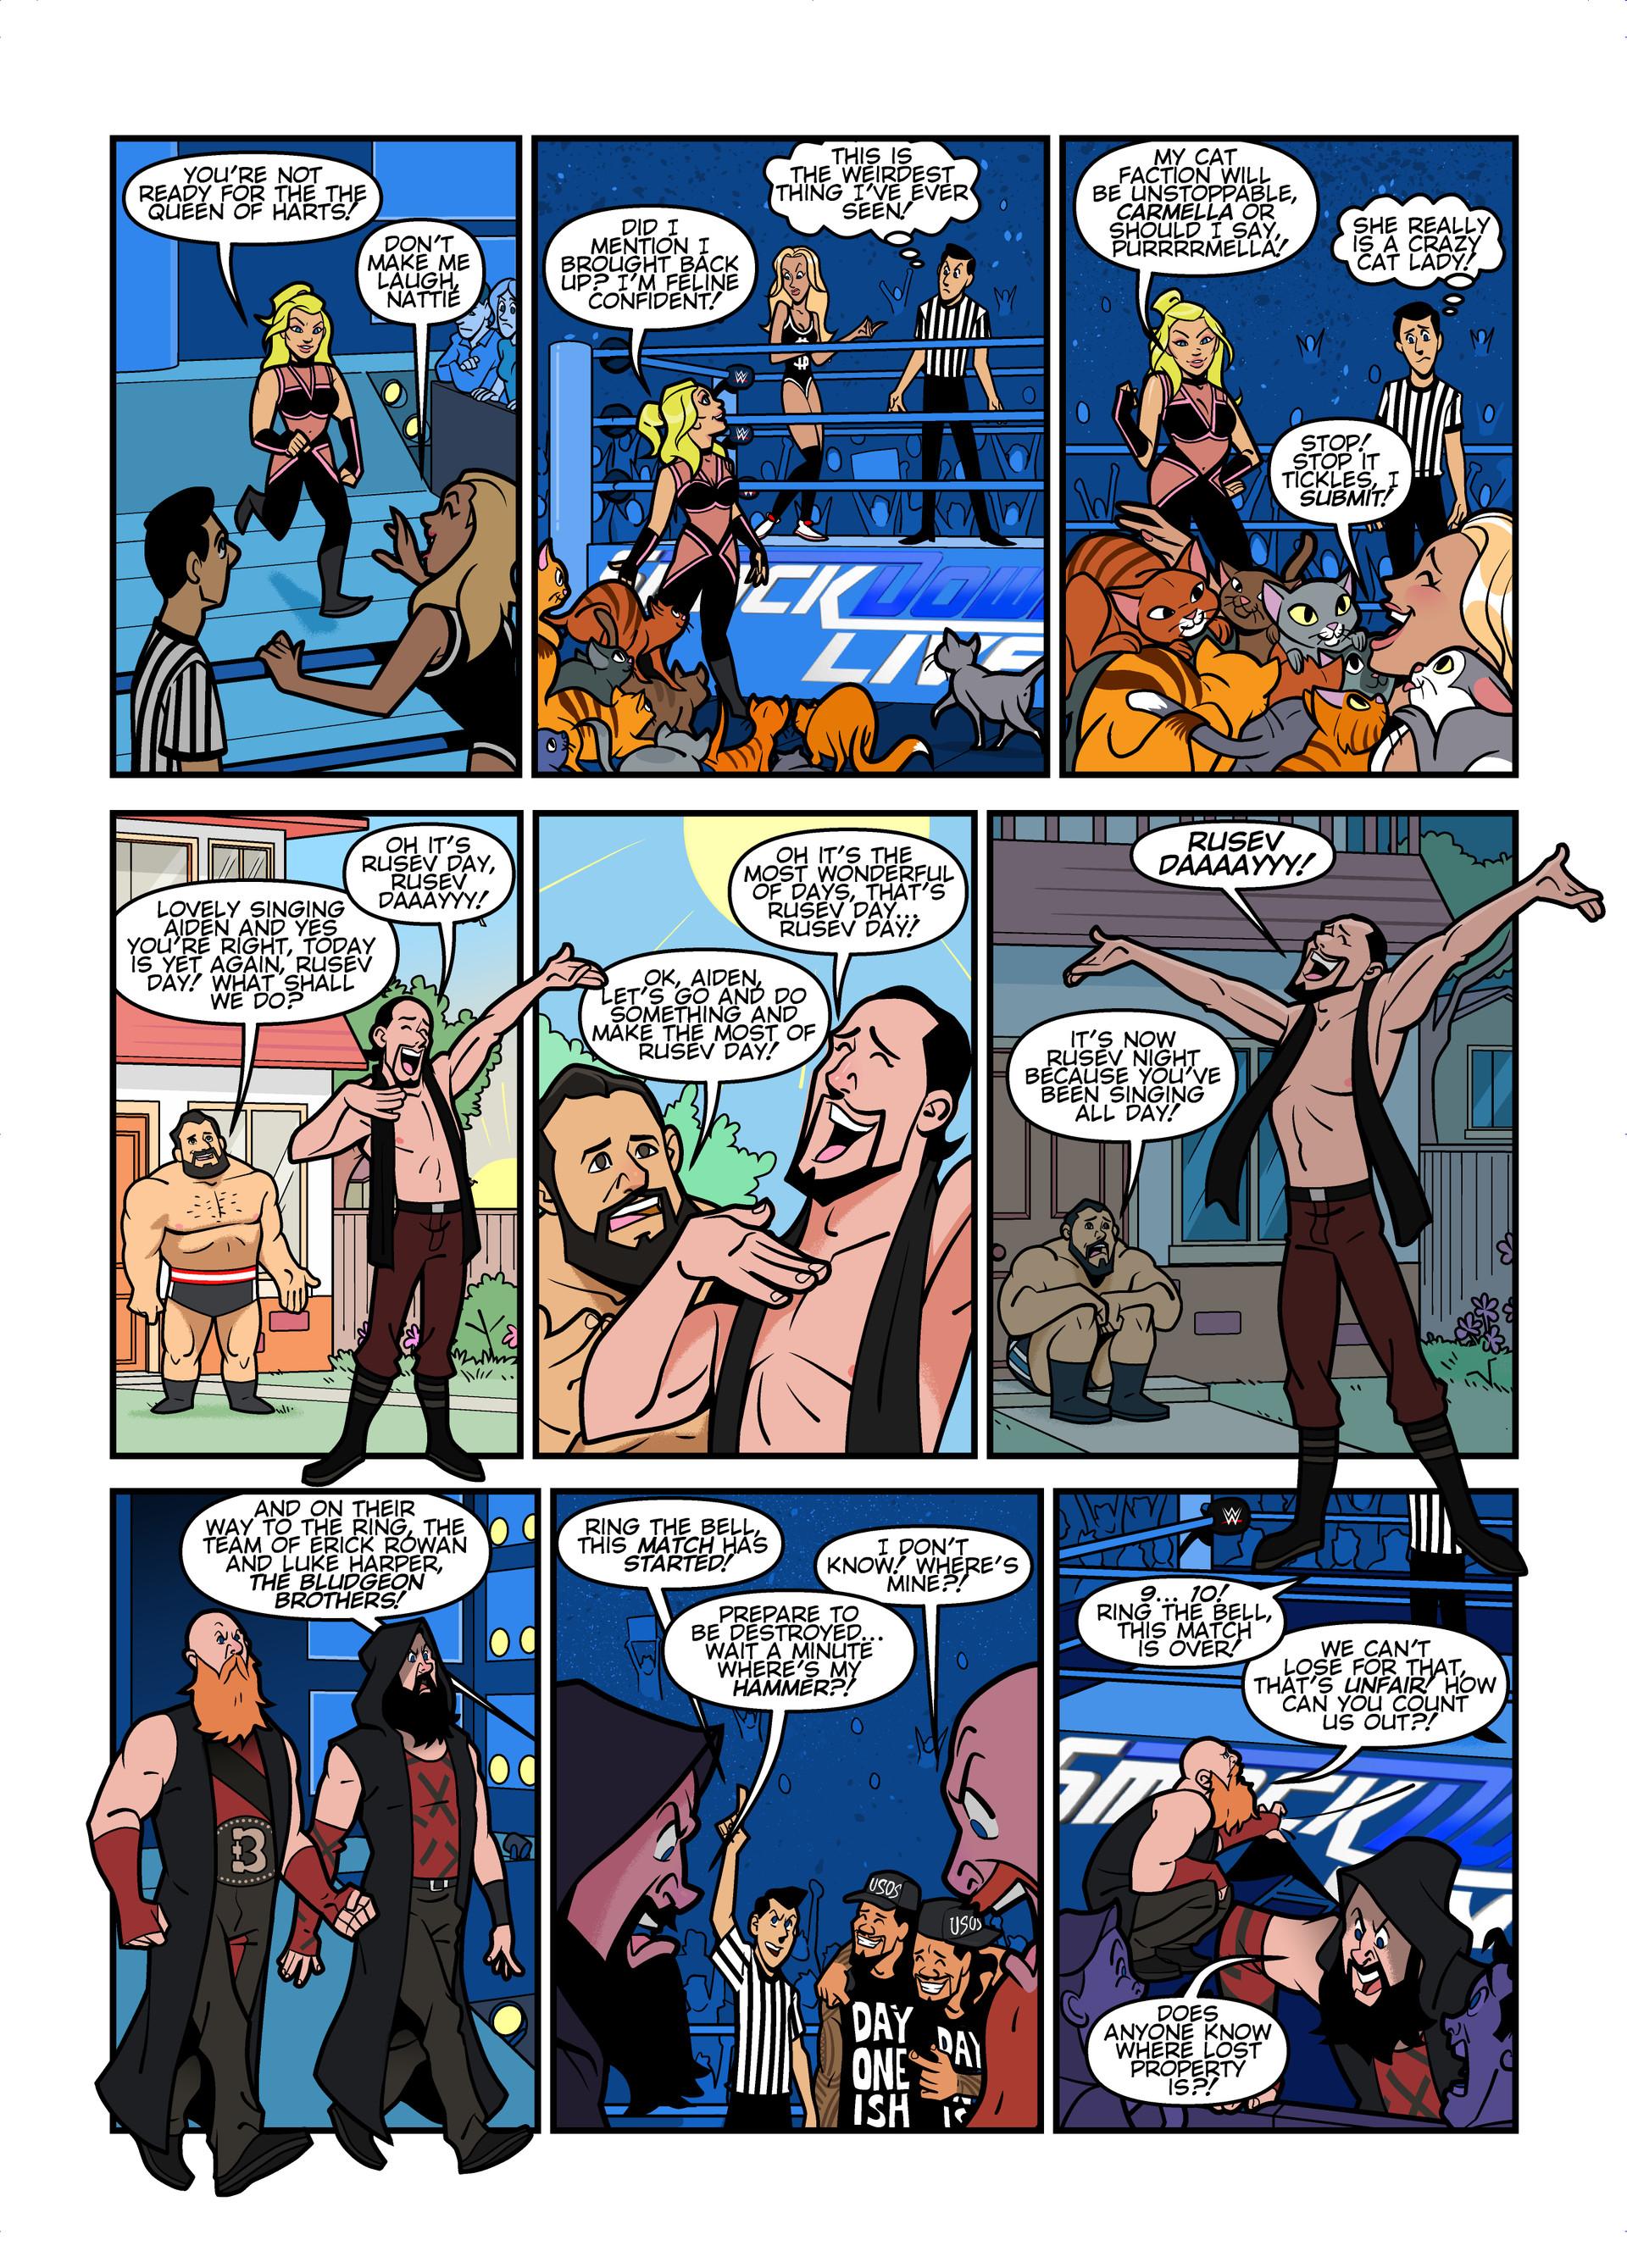 WWE Smackdown Live comic strips for WWE Kids Magazine #133